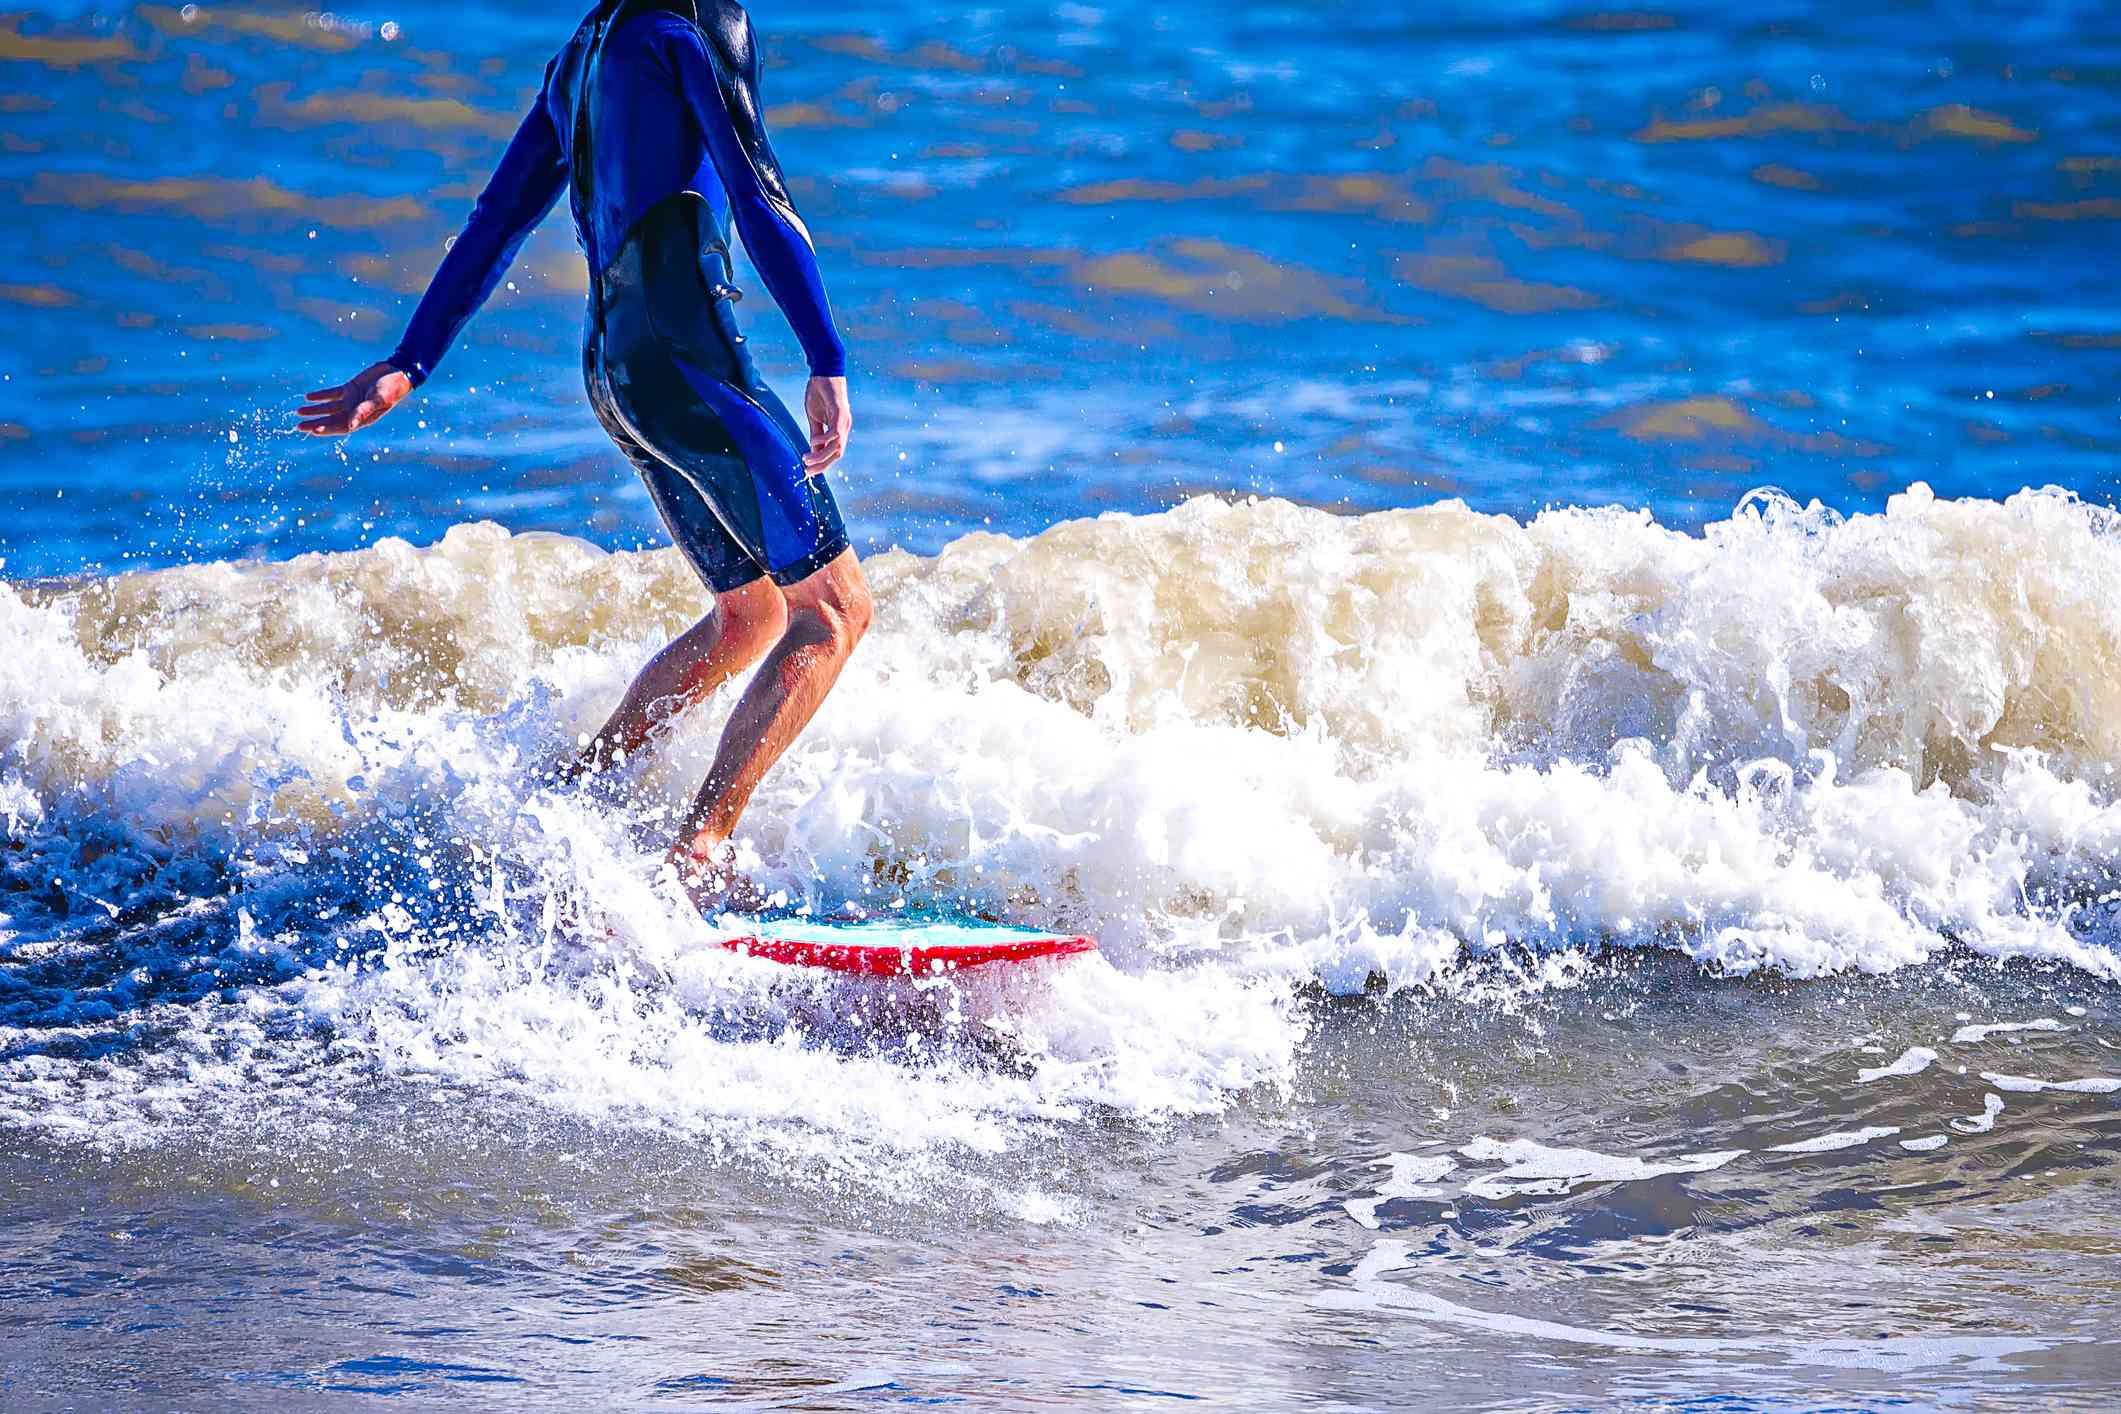 Surfer riding a wave in Folly Beach, SC